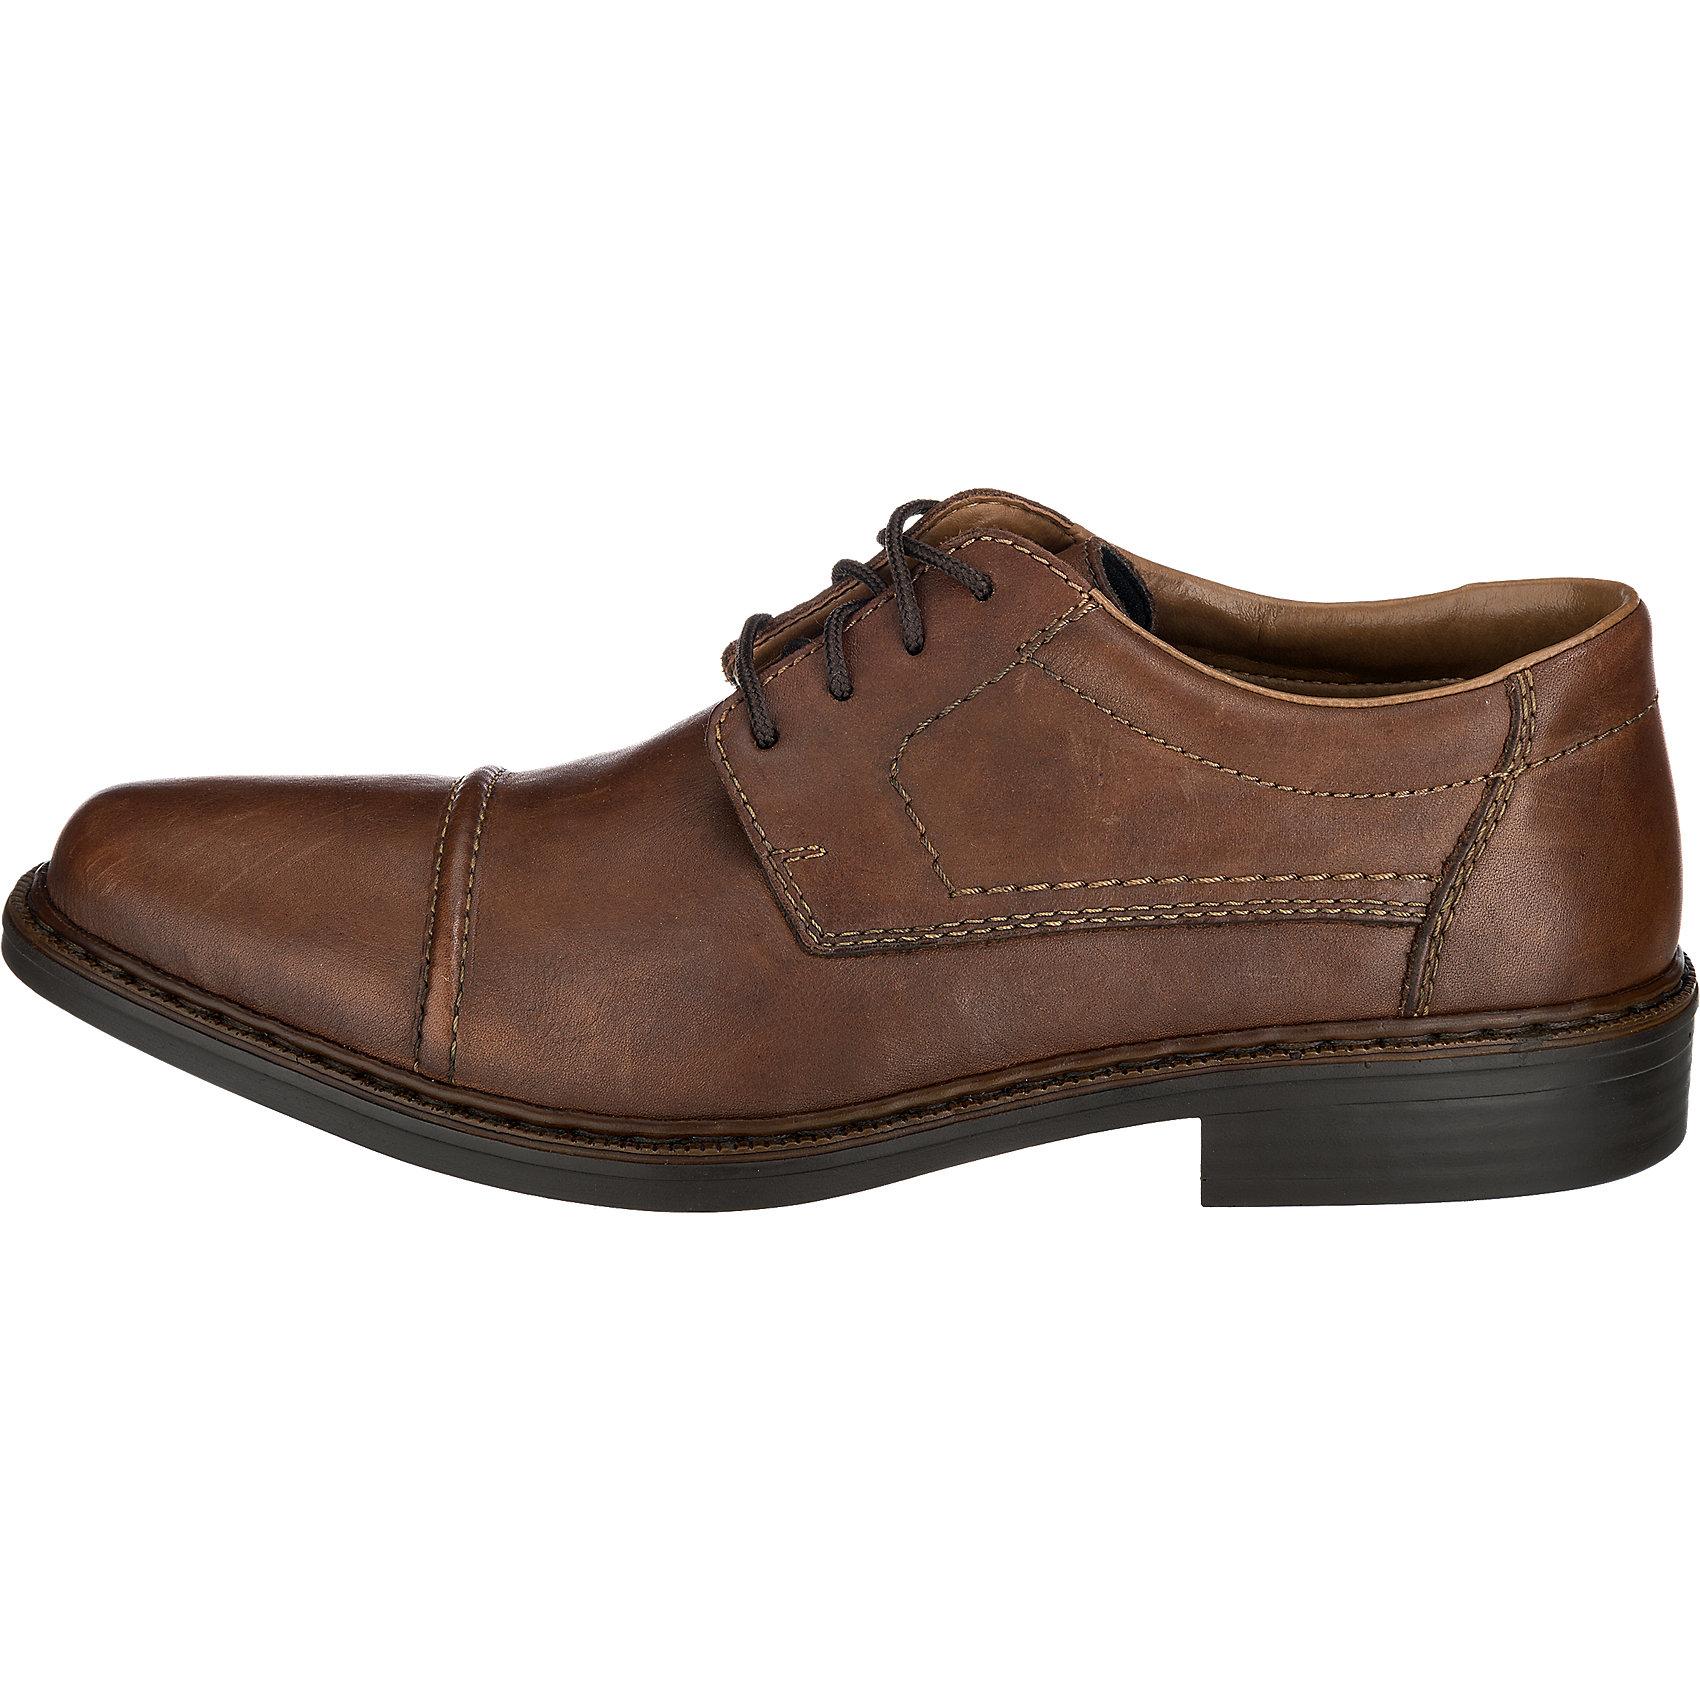 (Ebay) Rieker Business Schuhe braun 5767720 Business Schuhe (Bisher EUR 74,95)